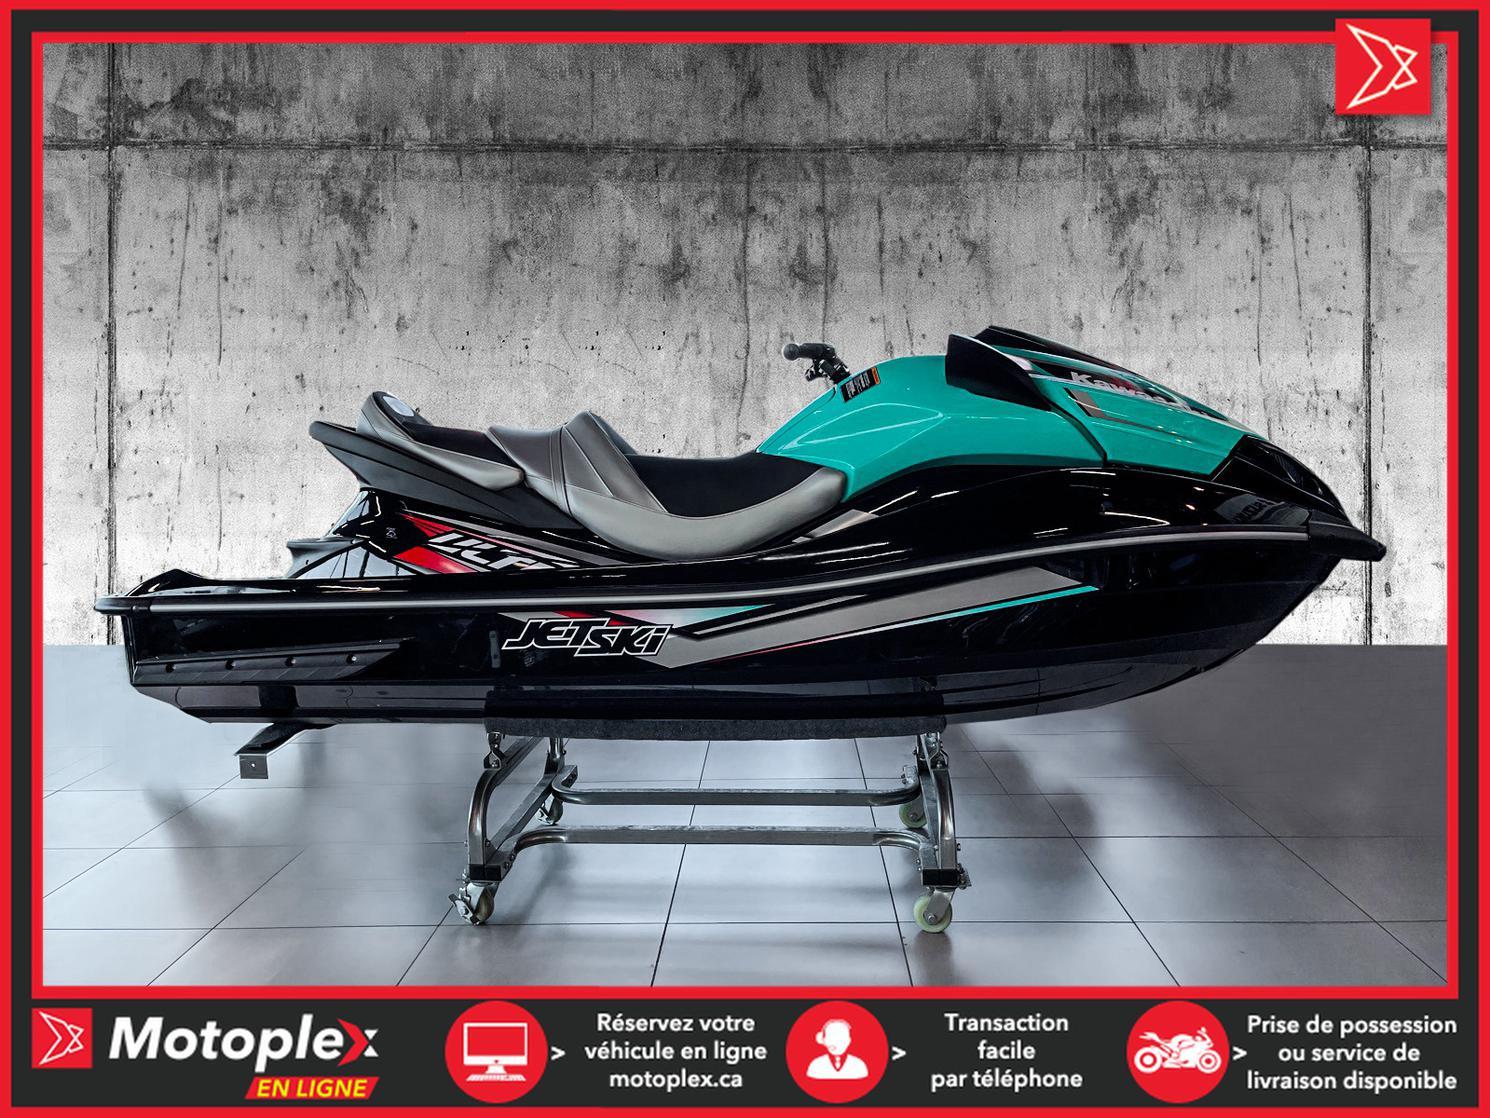 Kawasaki MOTOMARINE JET SKI ULTRA LX (3 PLACES) 2021